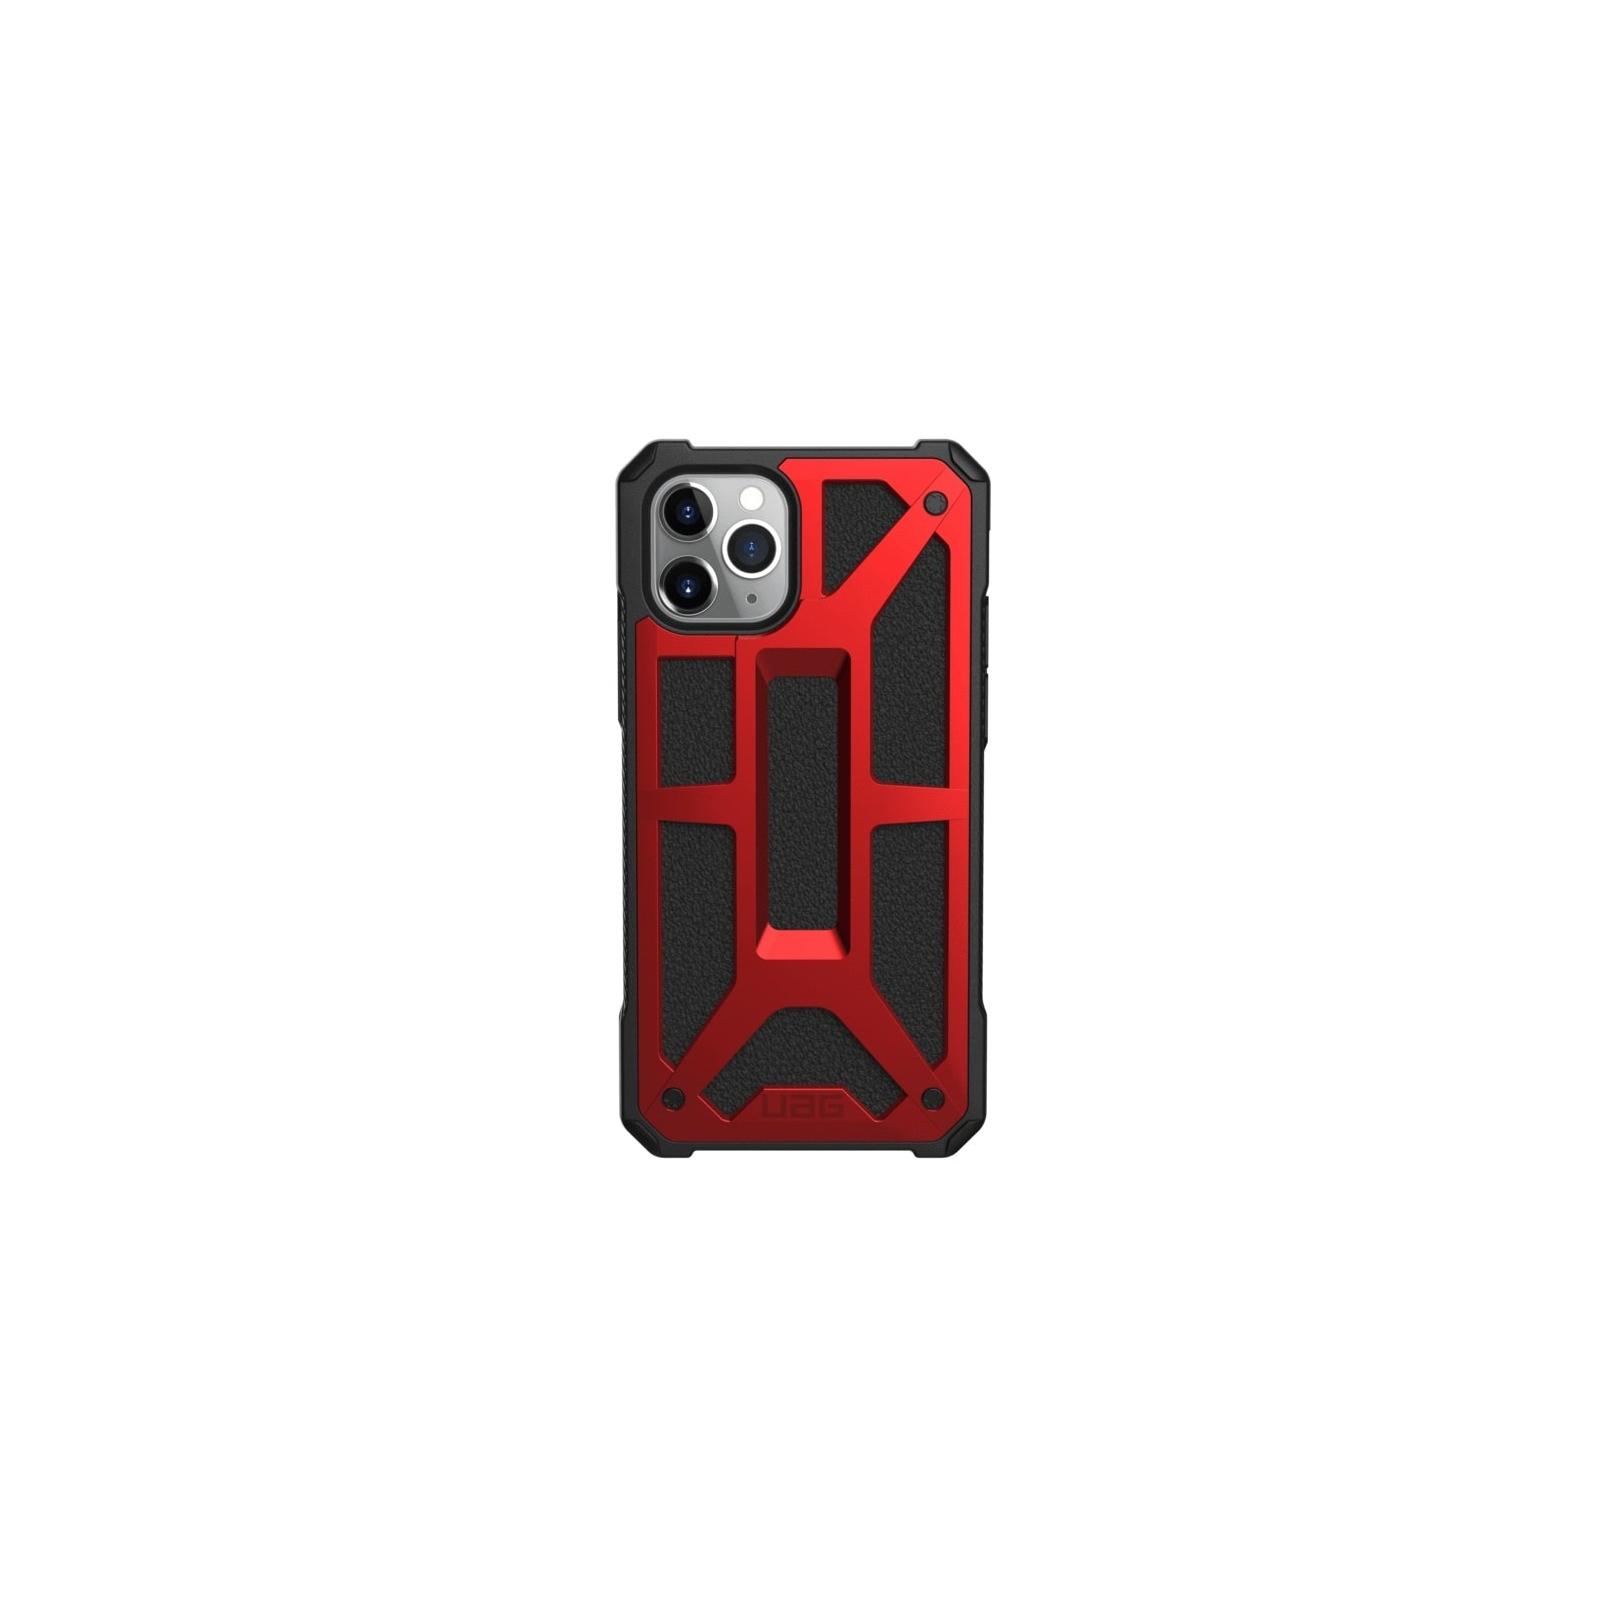 Чехол для моб. телефона Uag iPhone 11 Pro Monarch, Black (111701114040)